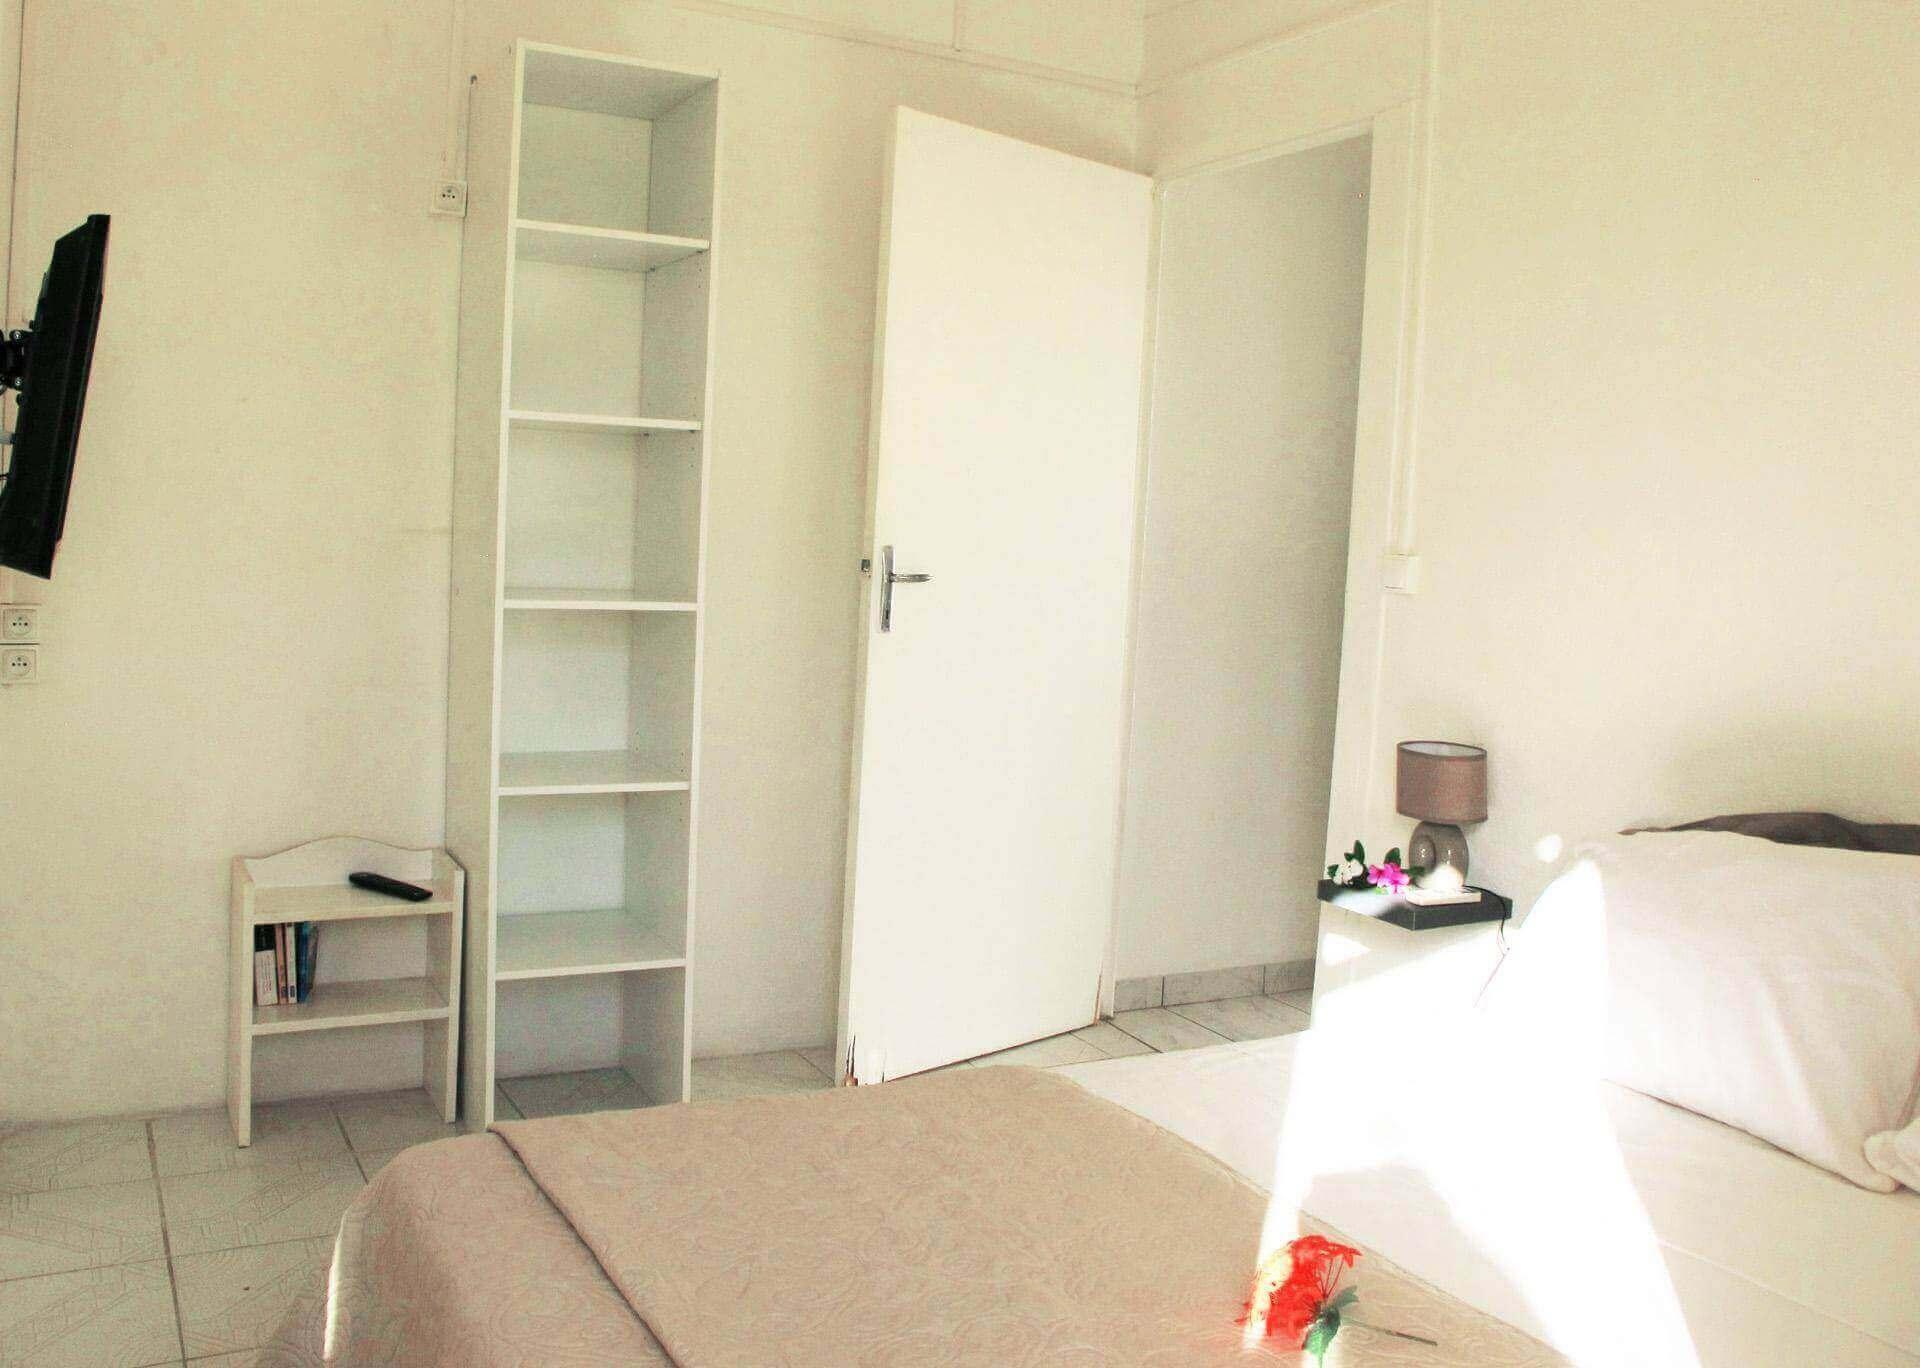 Location maison appartement guadeloupe 97190 le gosier 98 for Appartement maison